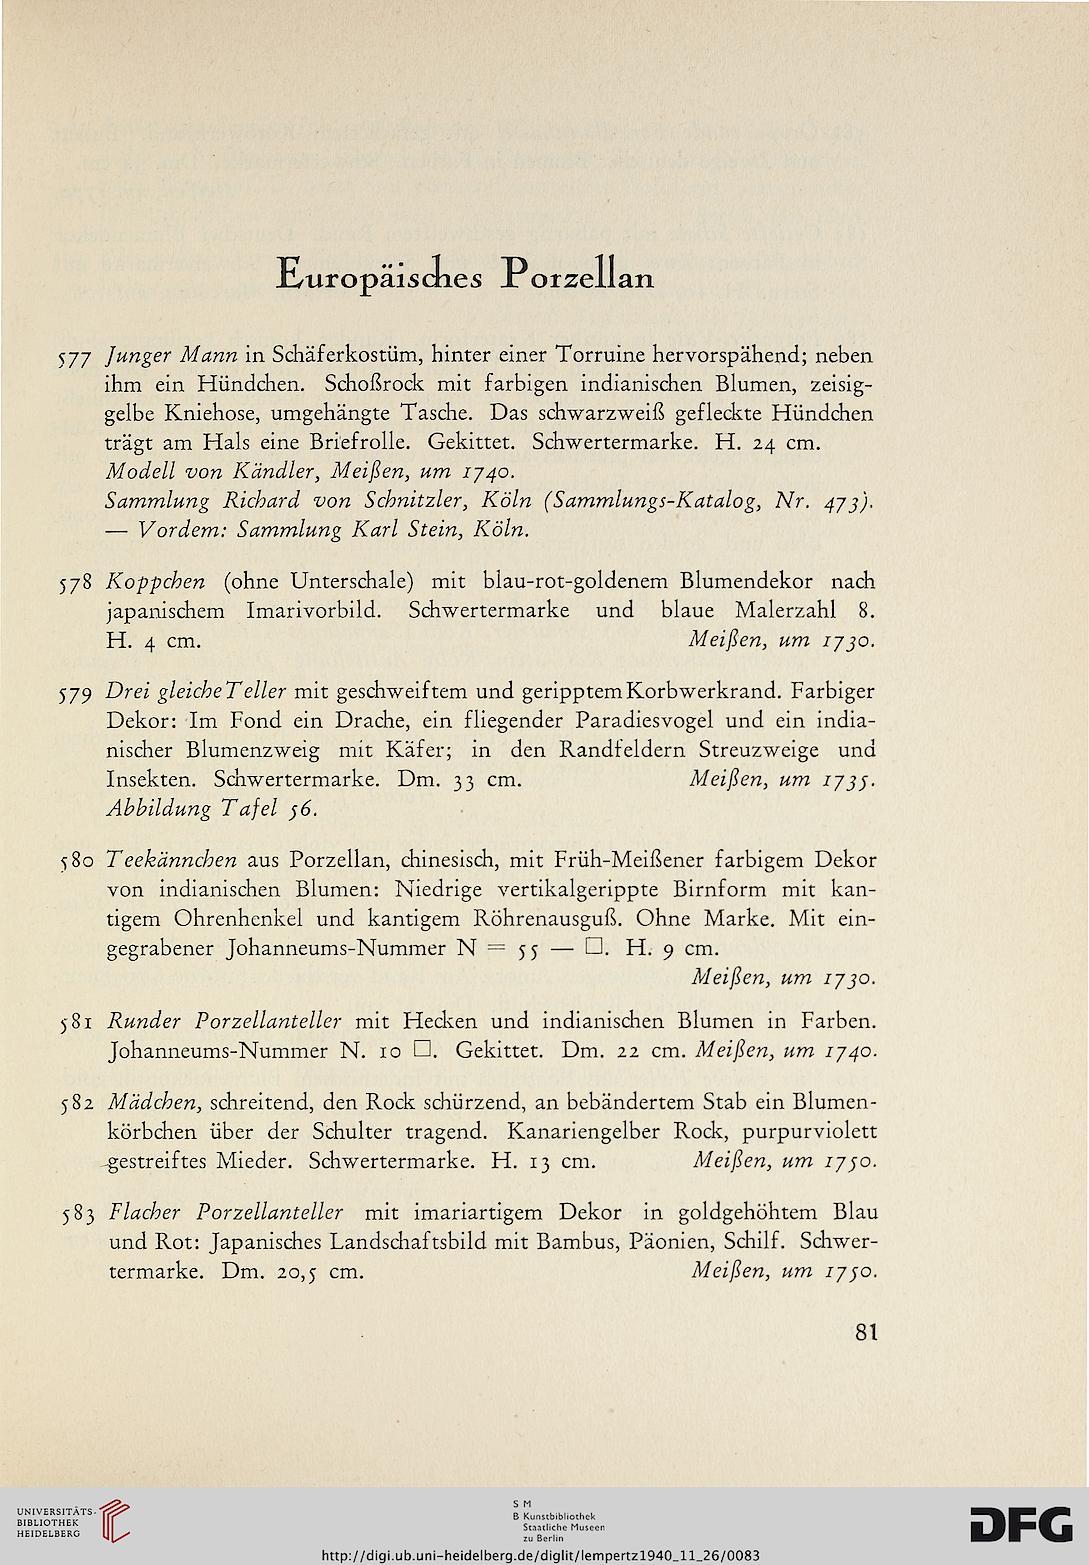 Kunsthaus Lempertz Koln Hrsg Sammlung Dr Kruger Meran Und